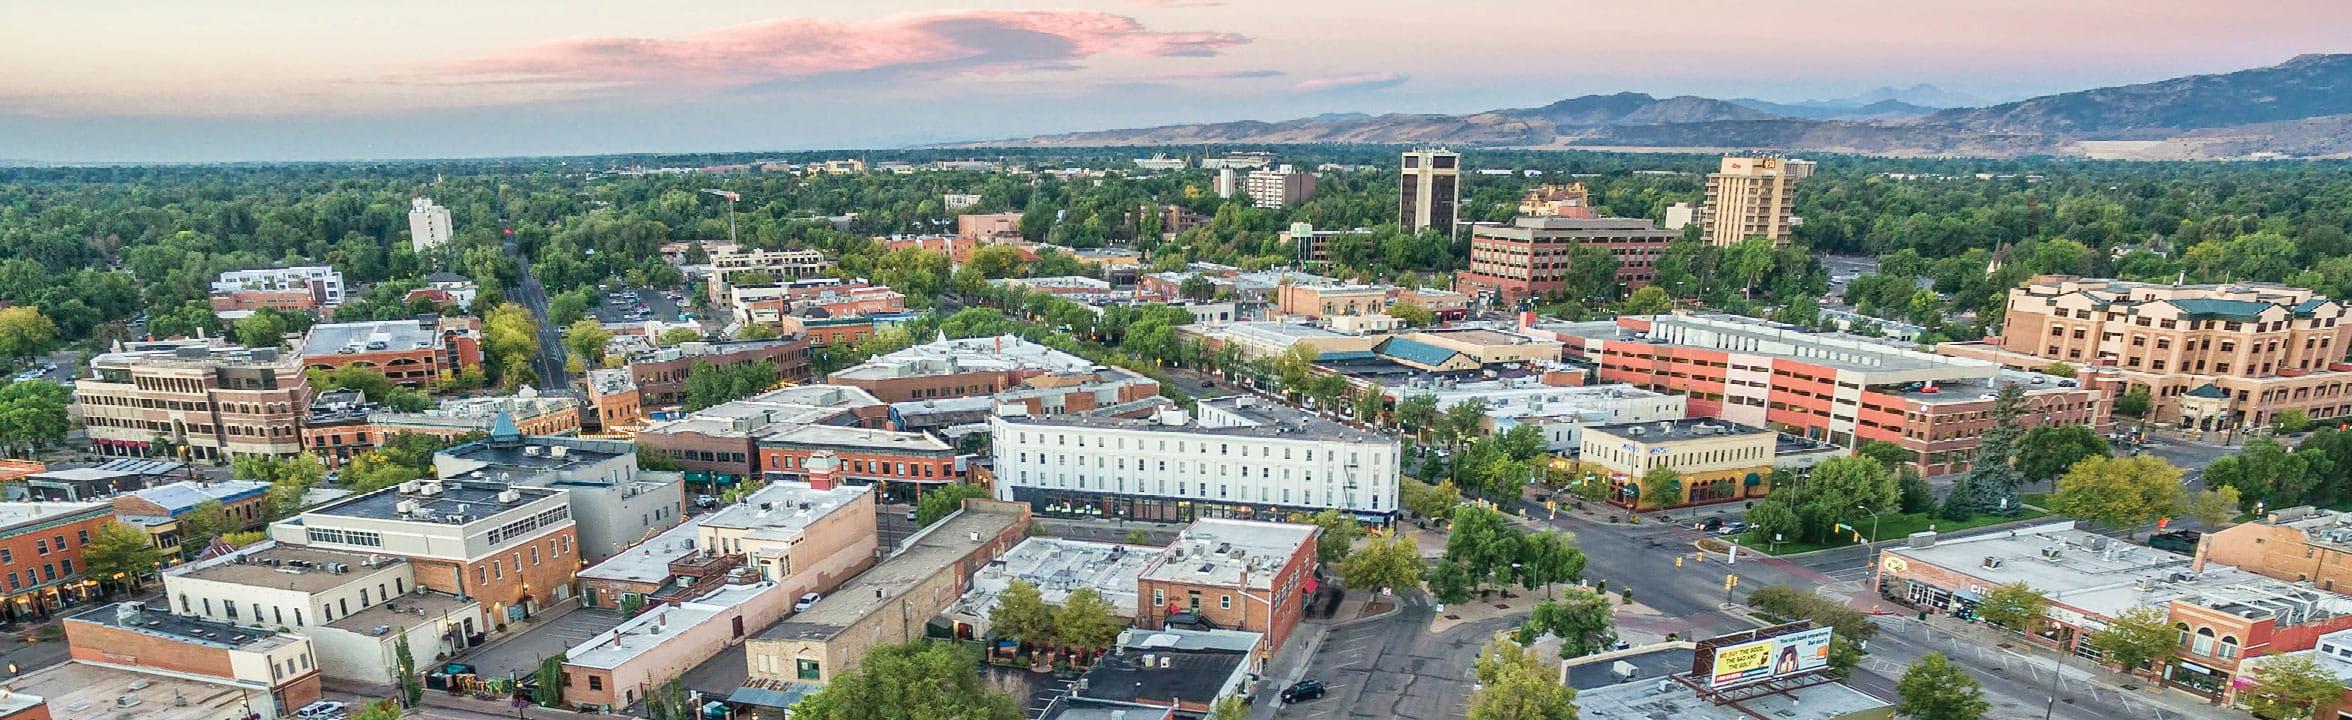 Fort Collins Colorado skyline